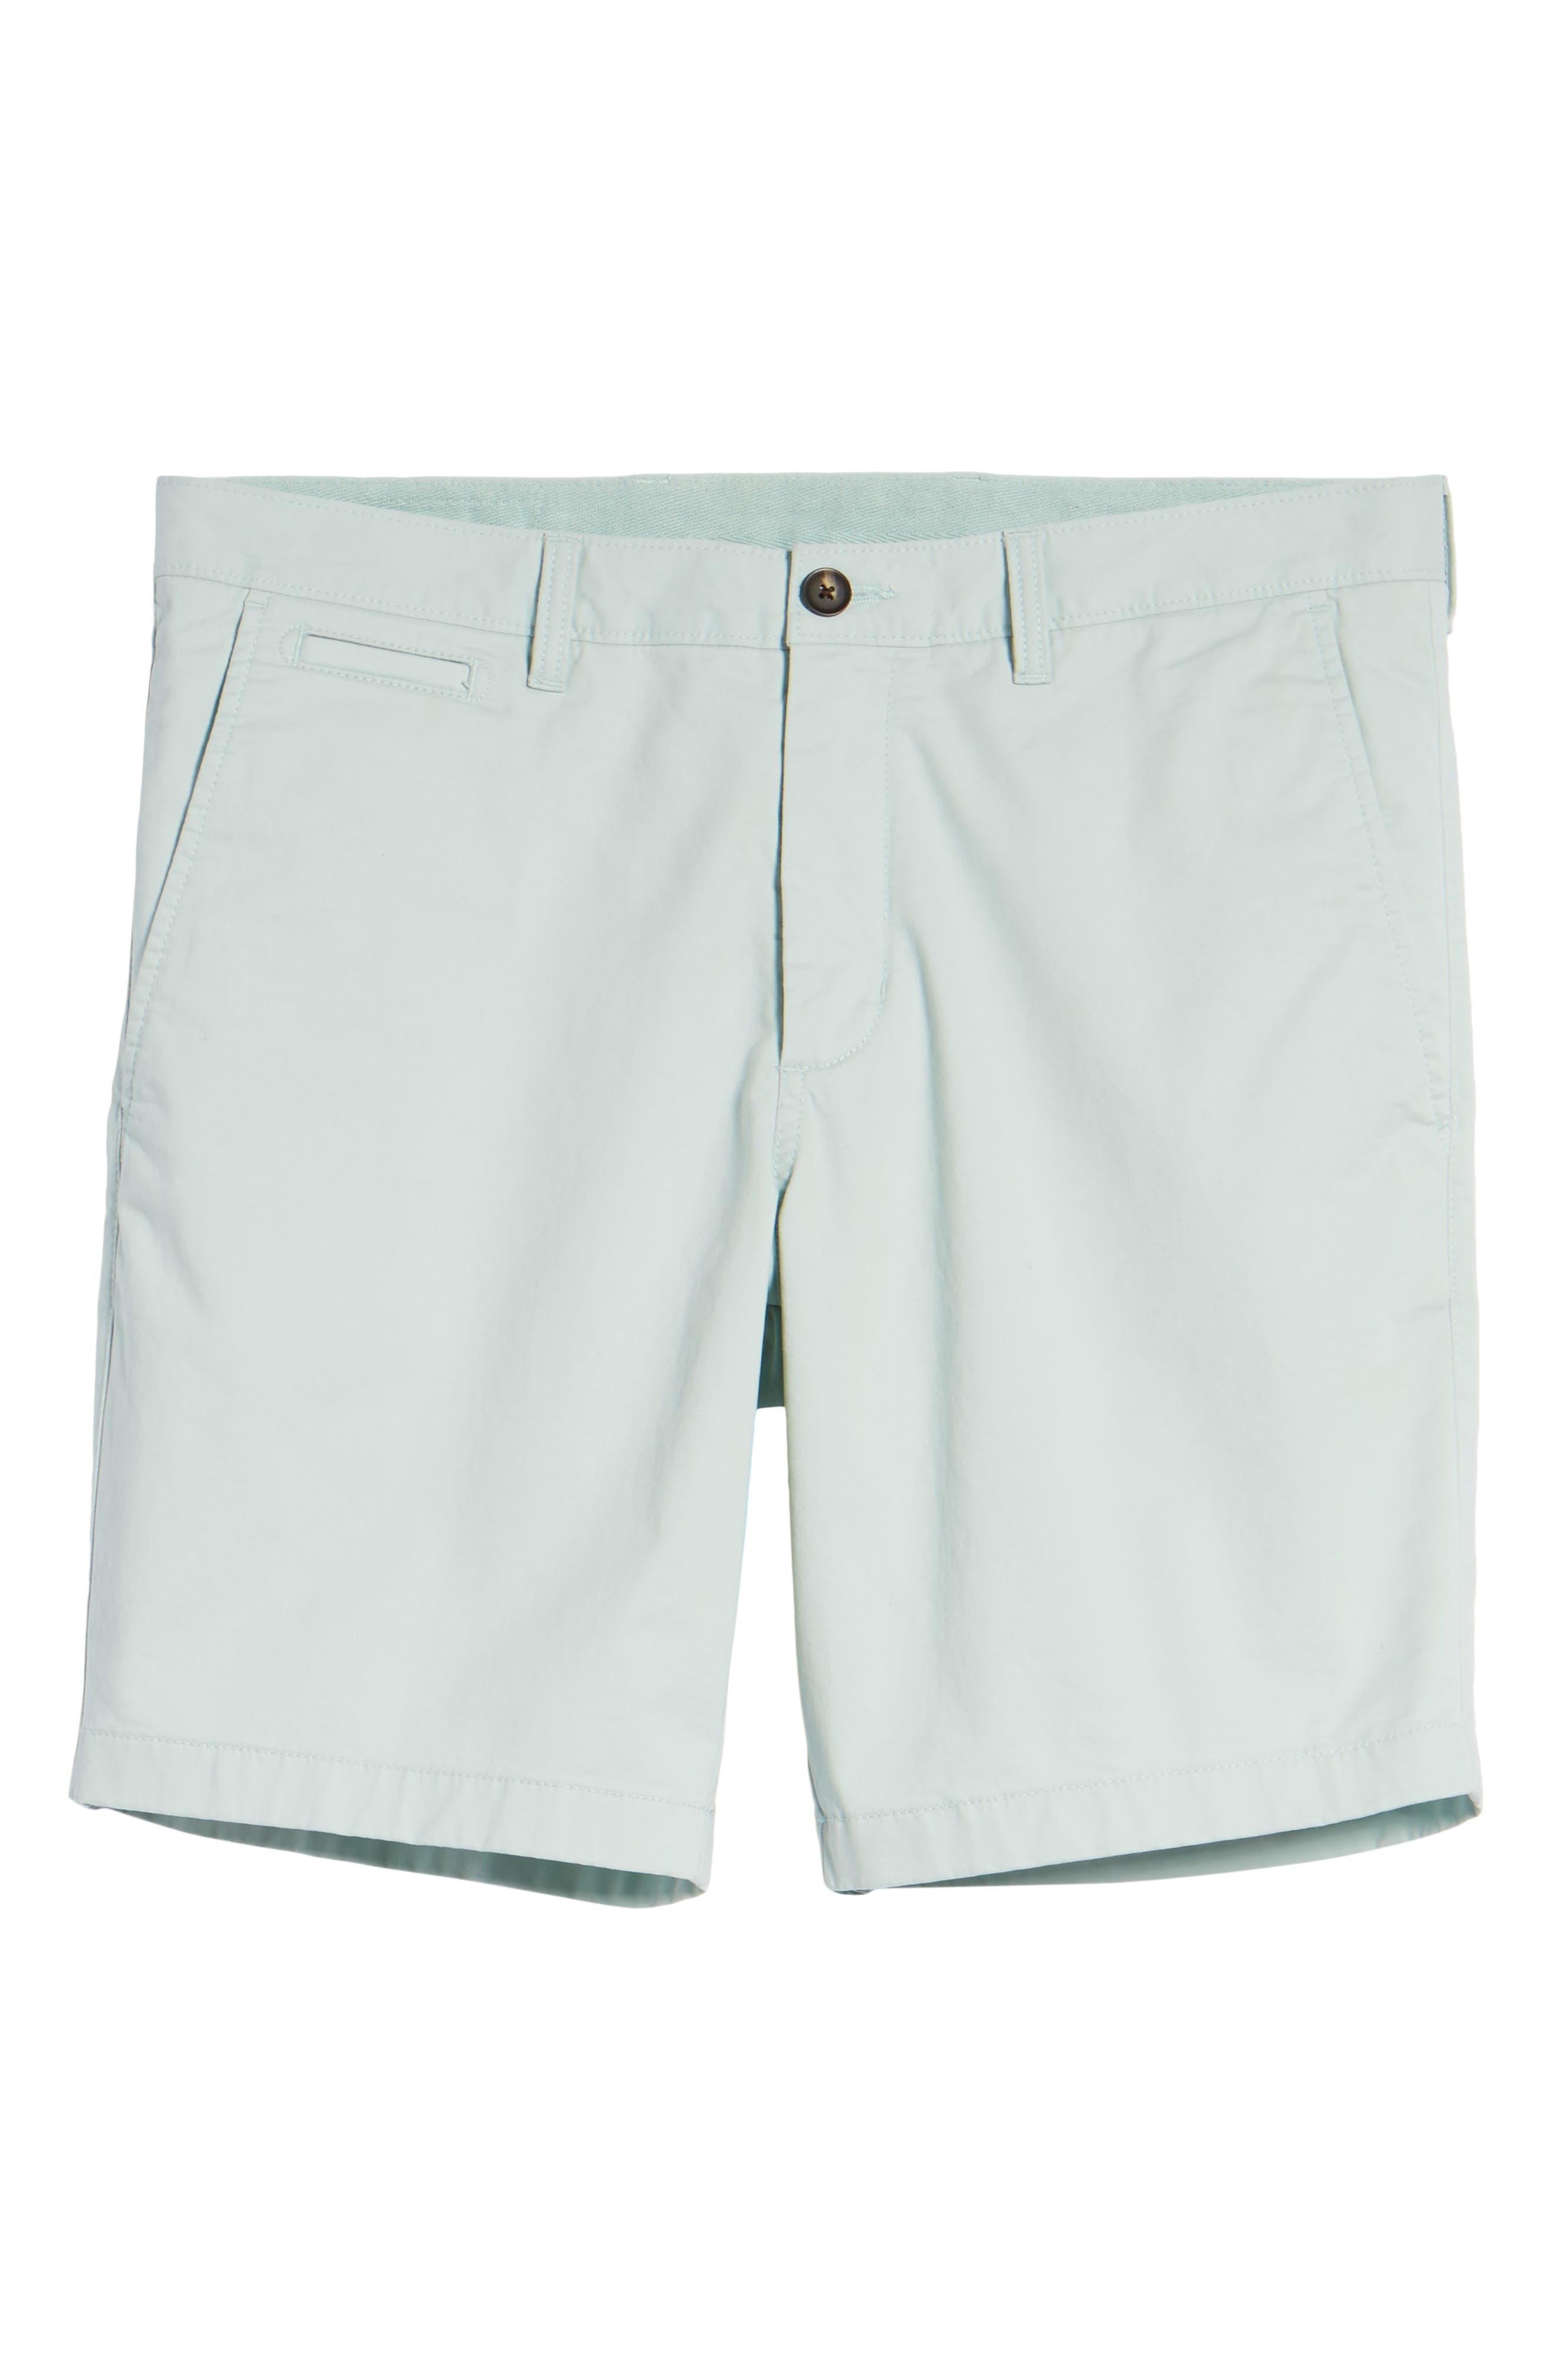 Ballard Slim Fit Stretch Chino 9-Inch Shorts,                             Alternate thumbnail 68, color,